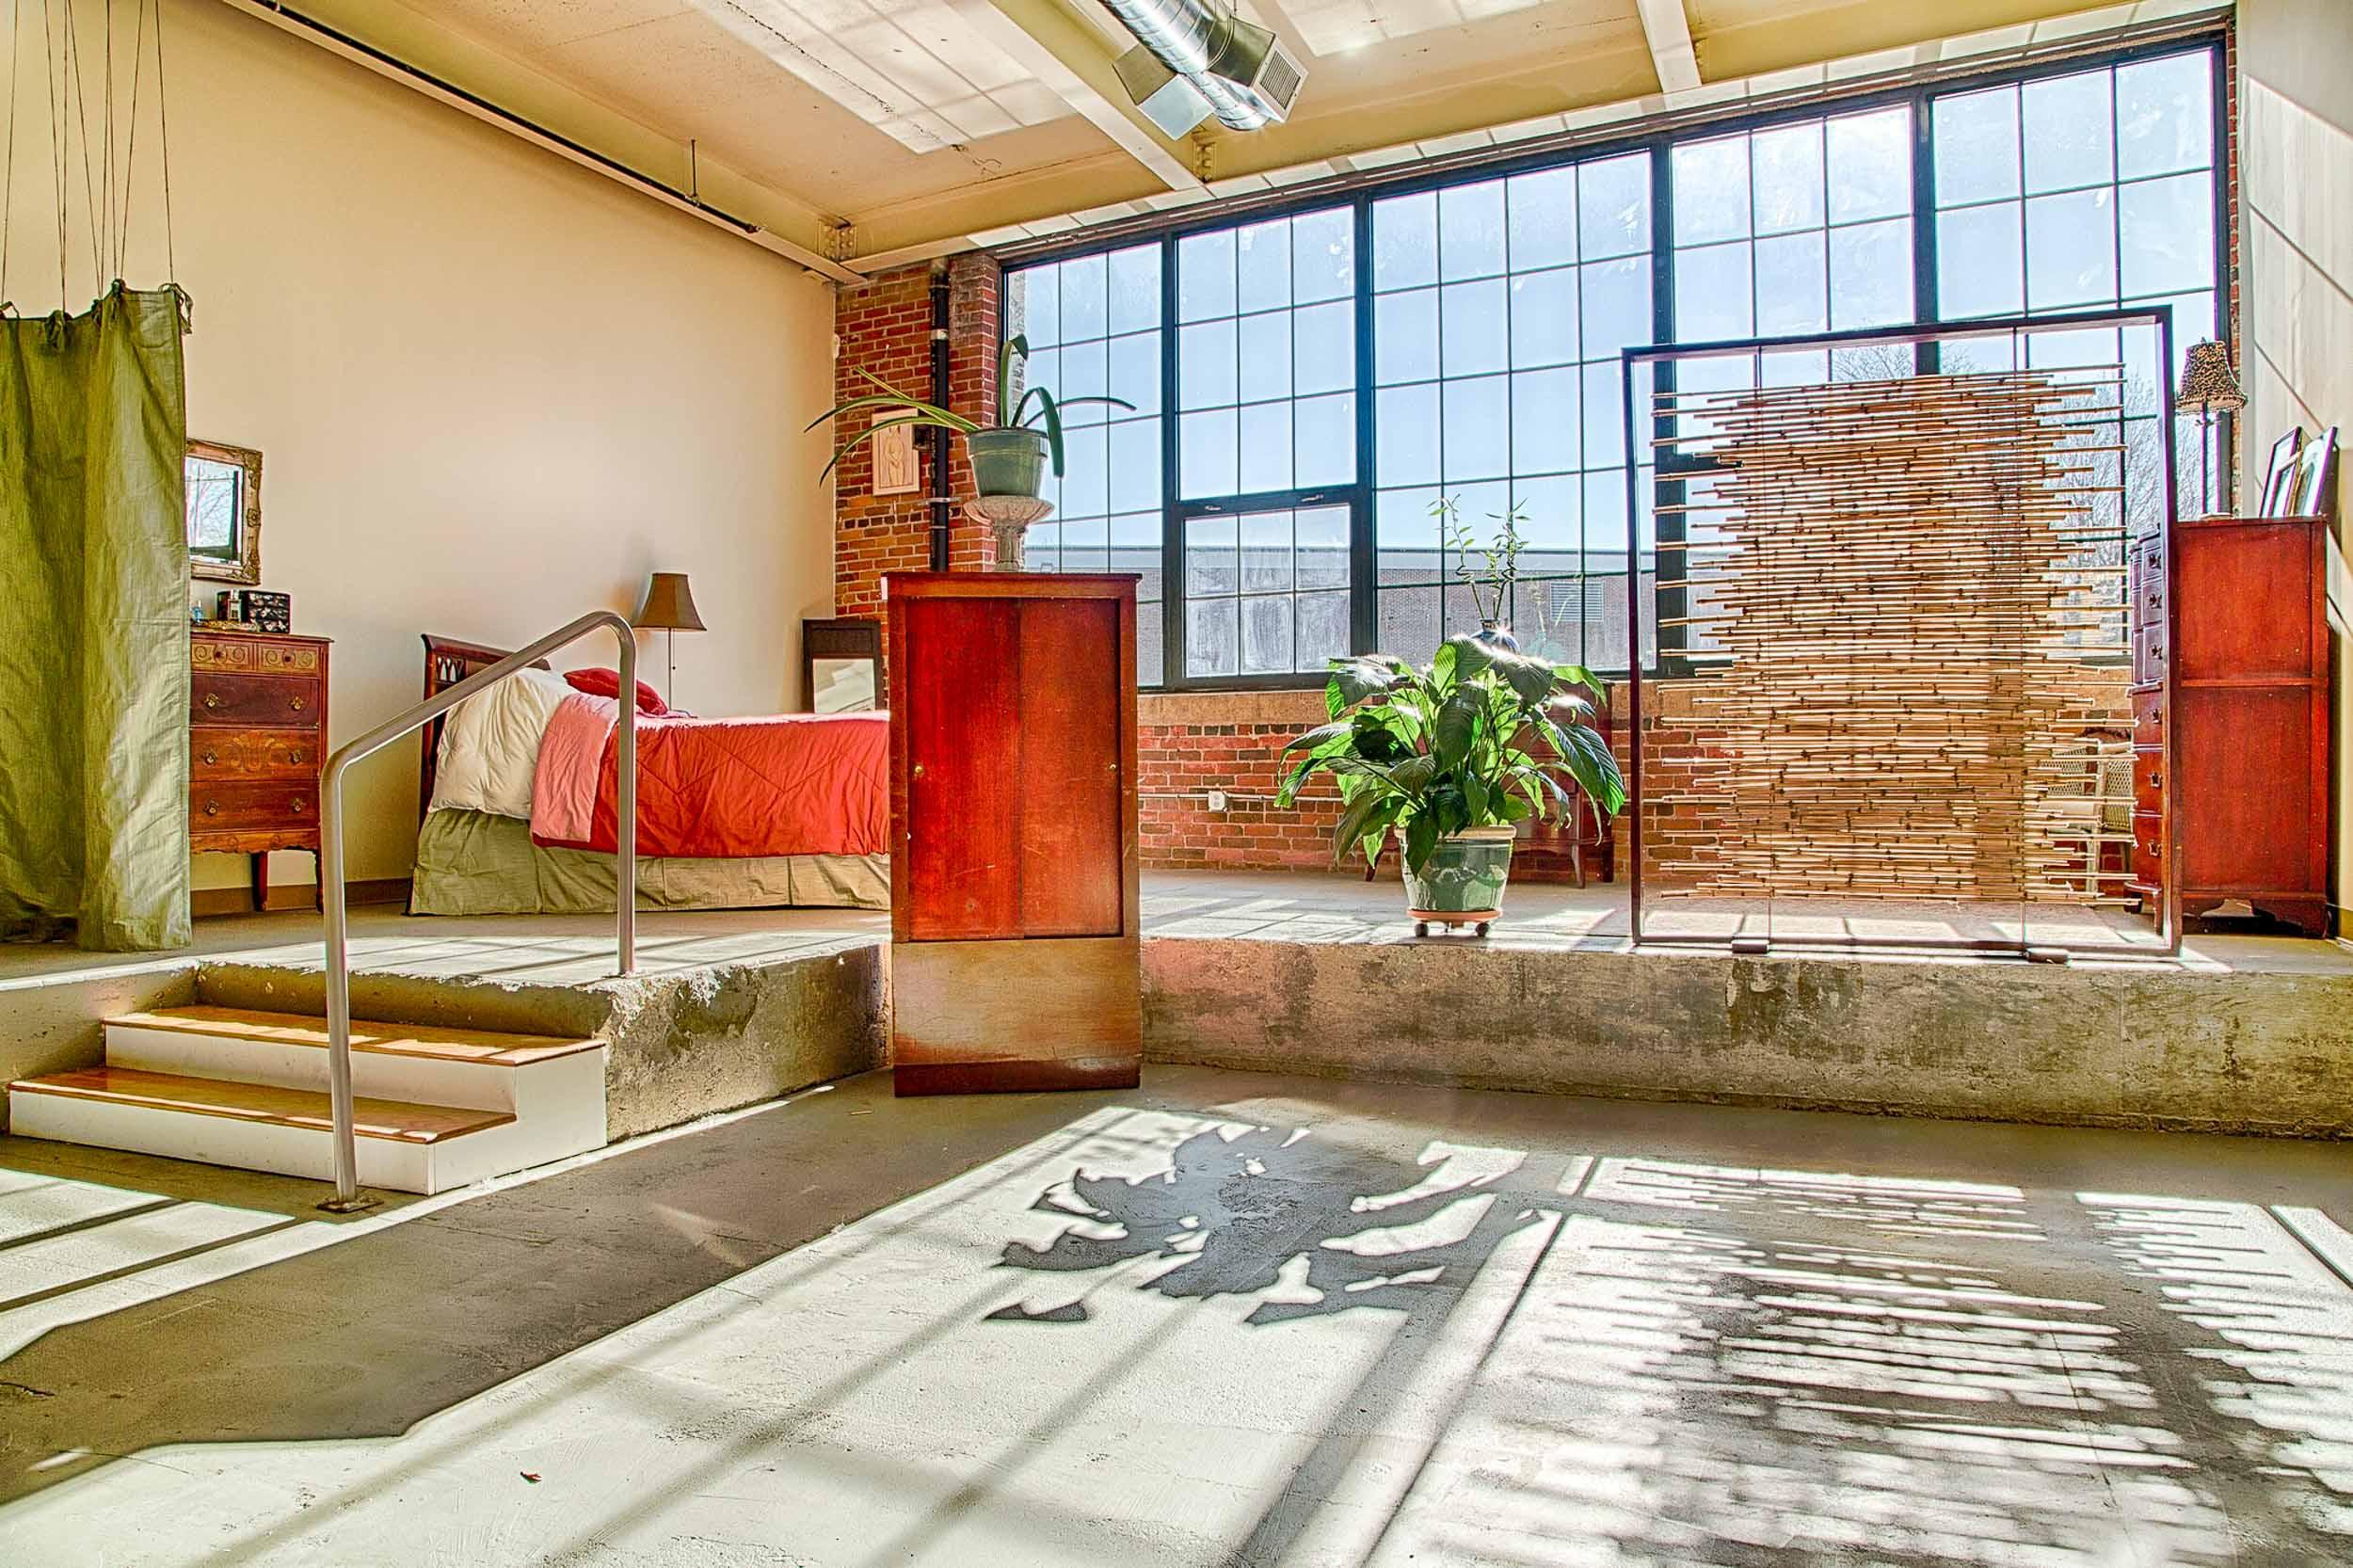 A bright spacious artist's loft interior design. Lowell, MA.